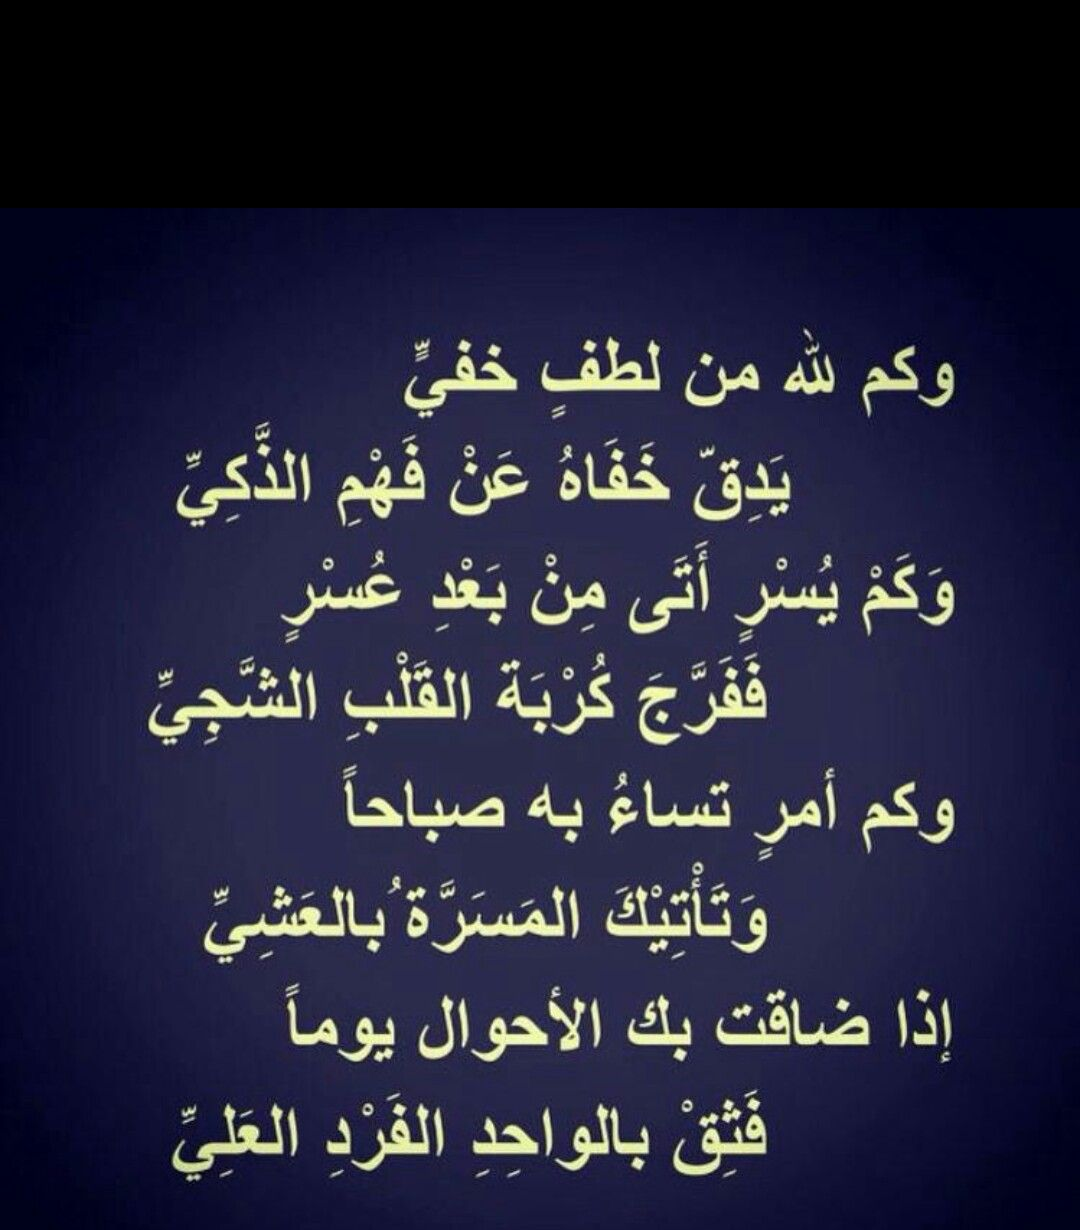 Pin By Nour Hammurabi On كلمات وعبارات جميله Quotations Arabic Calligraphy Quotes